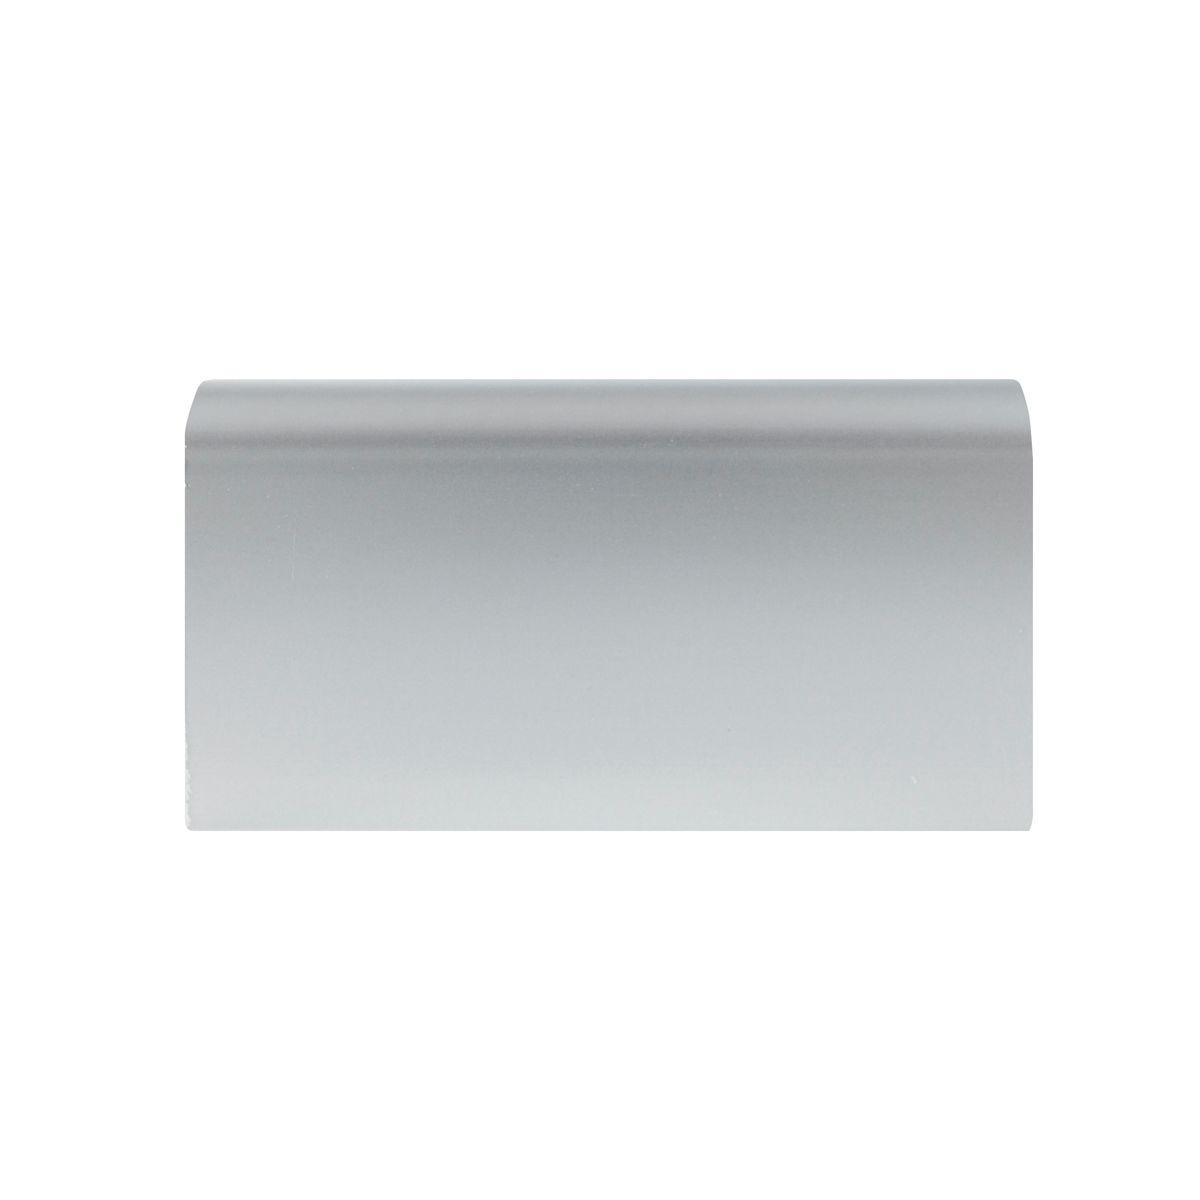 Battiscopa passacavo plus alluminio 15 x 80 x 2000 mm for Battiscopa leroy merlin